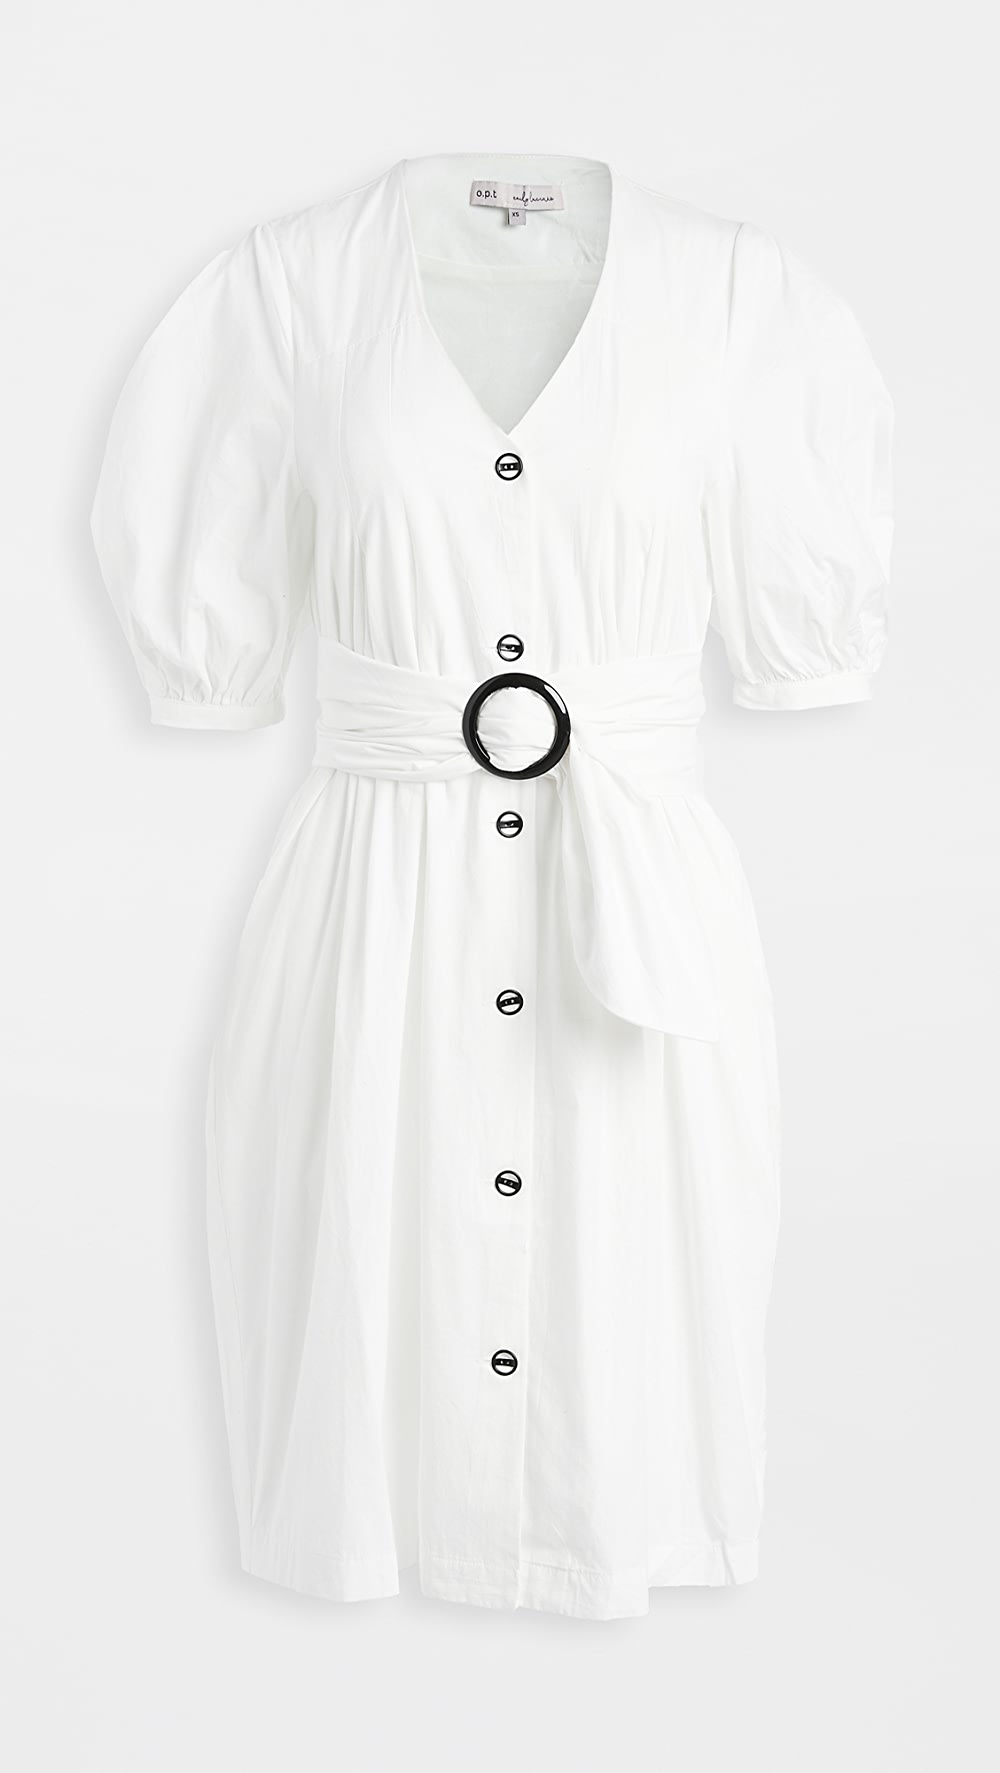 100% Quality Opt - Aria Dress Superior Performance